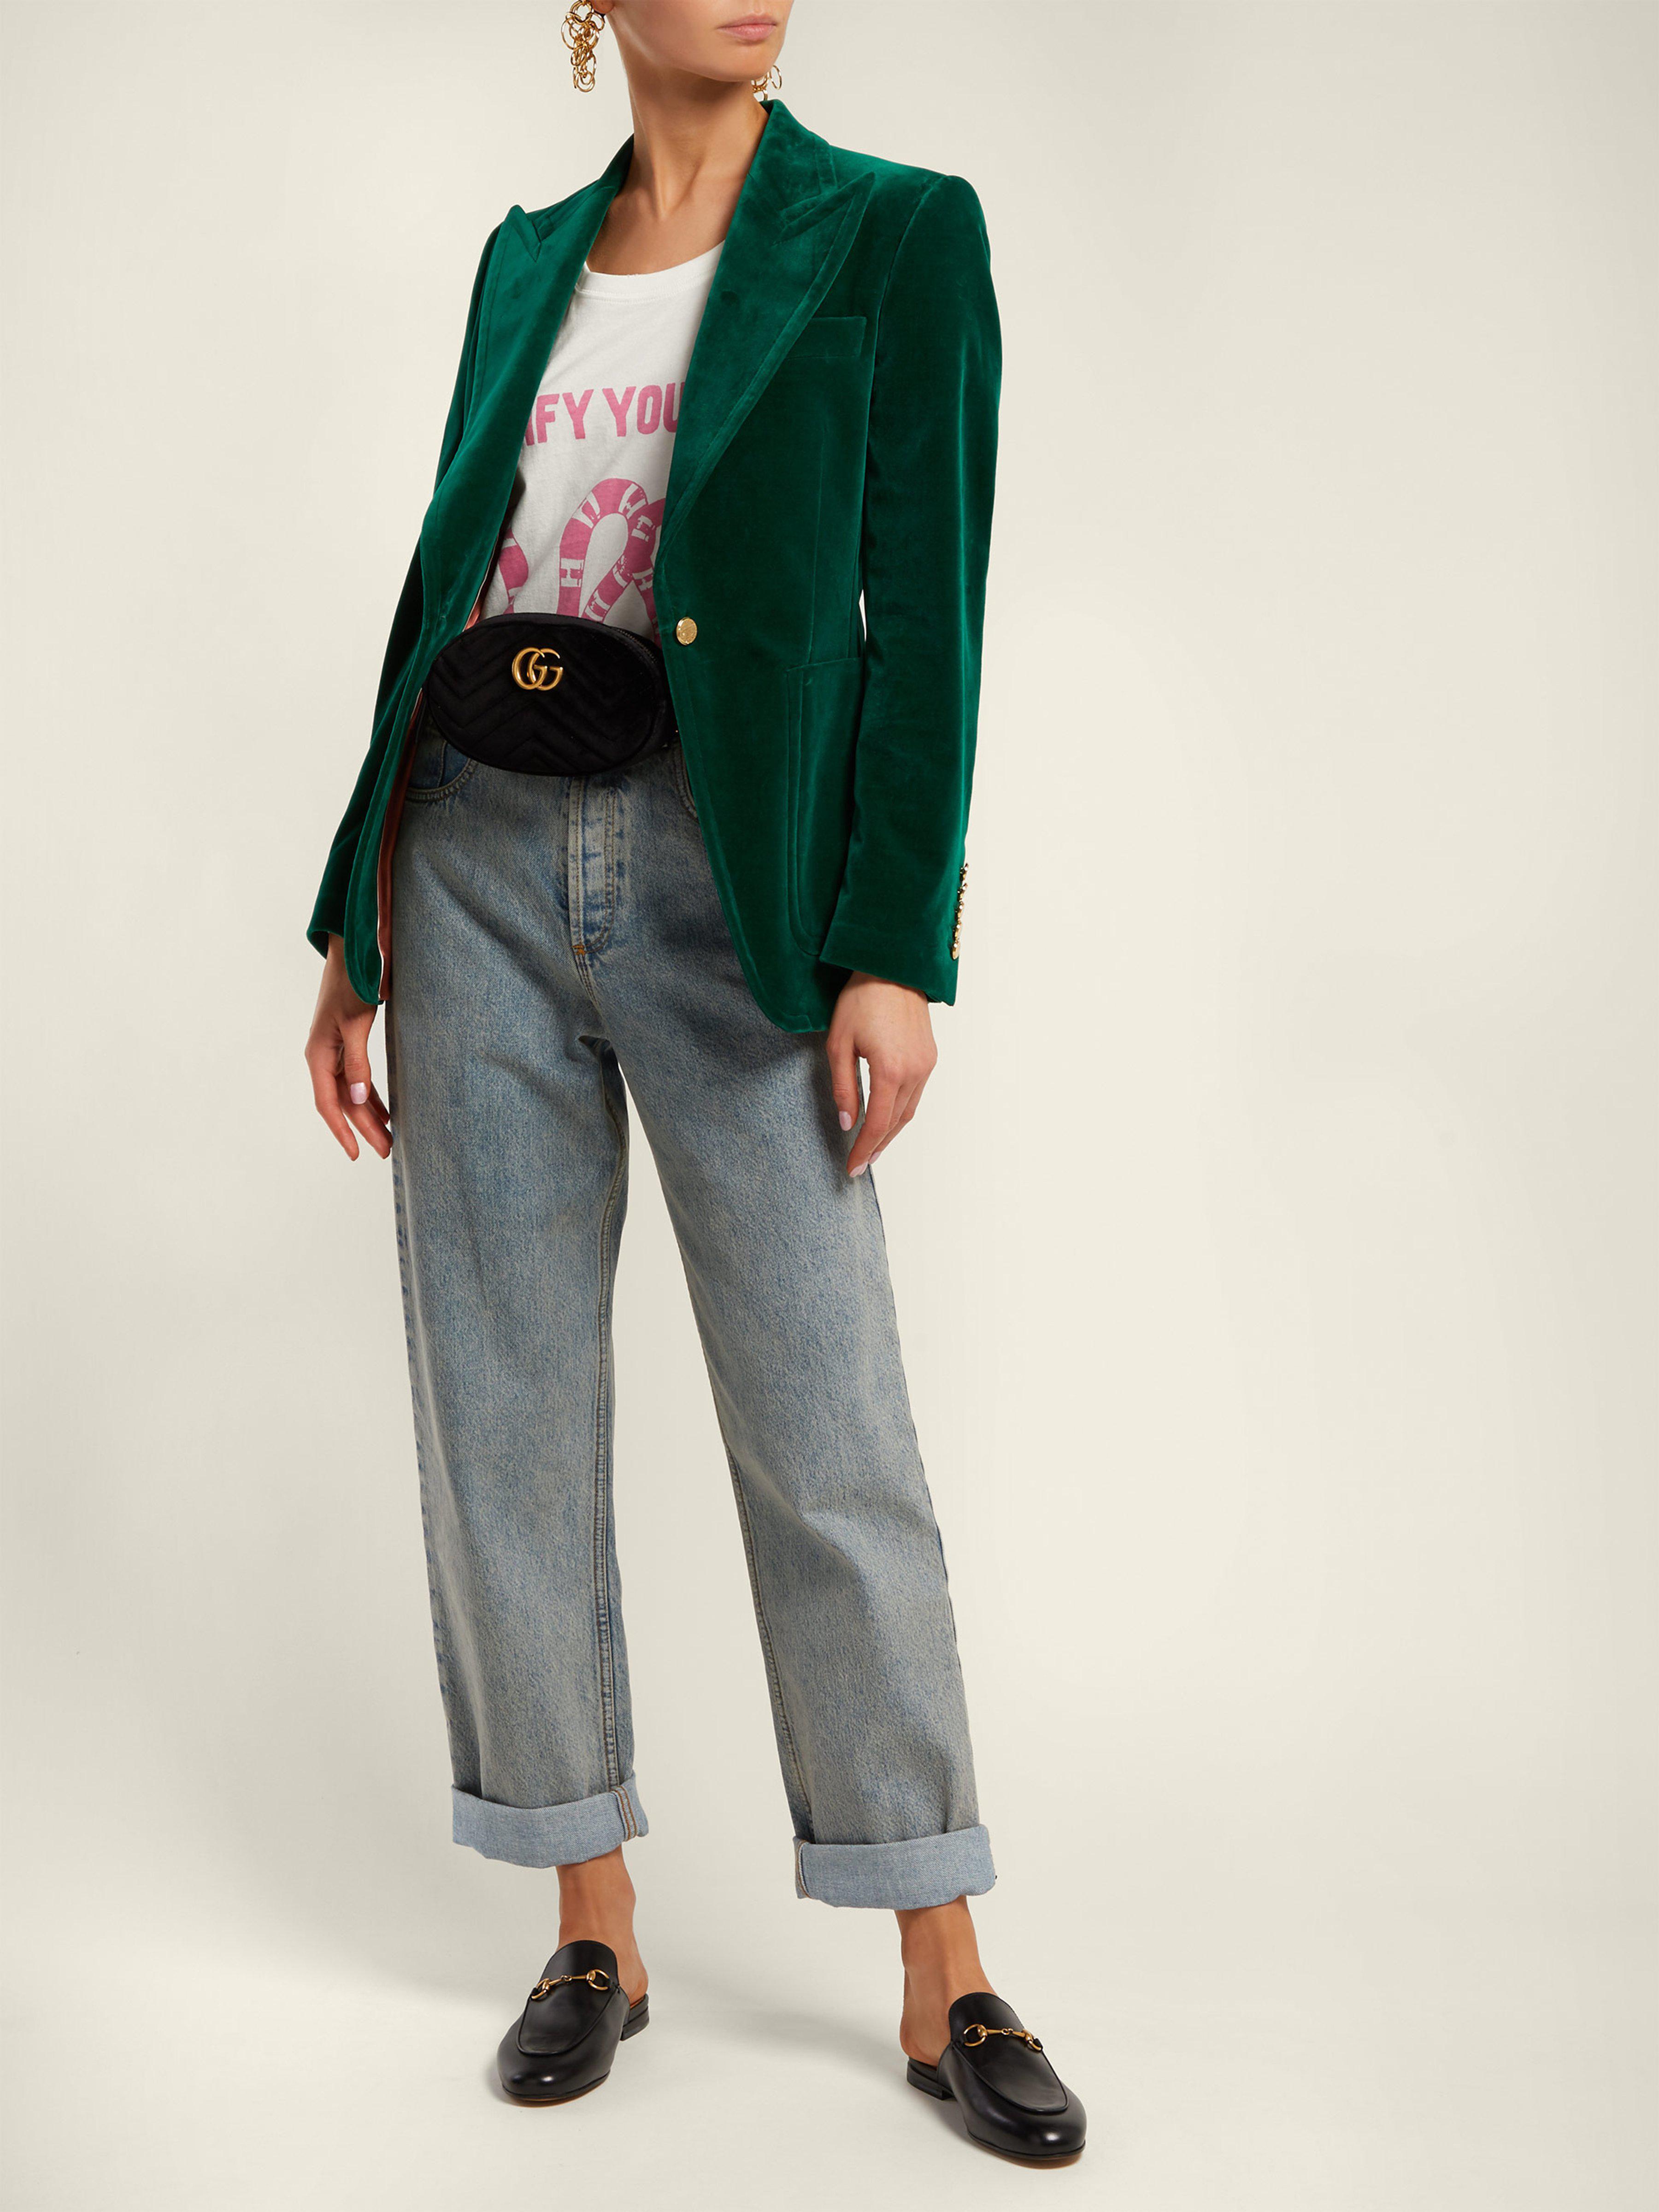 325b7848cbe Gucci Gg Marmont Quilted Velvet Belt Bag in Black - Lyst